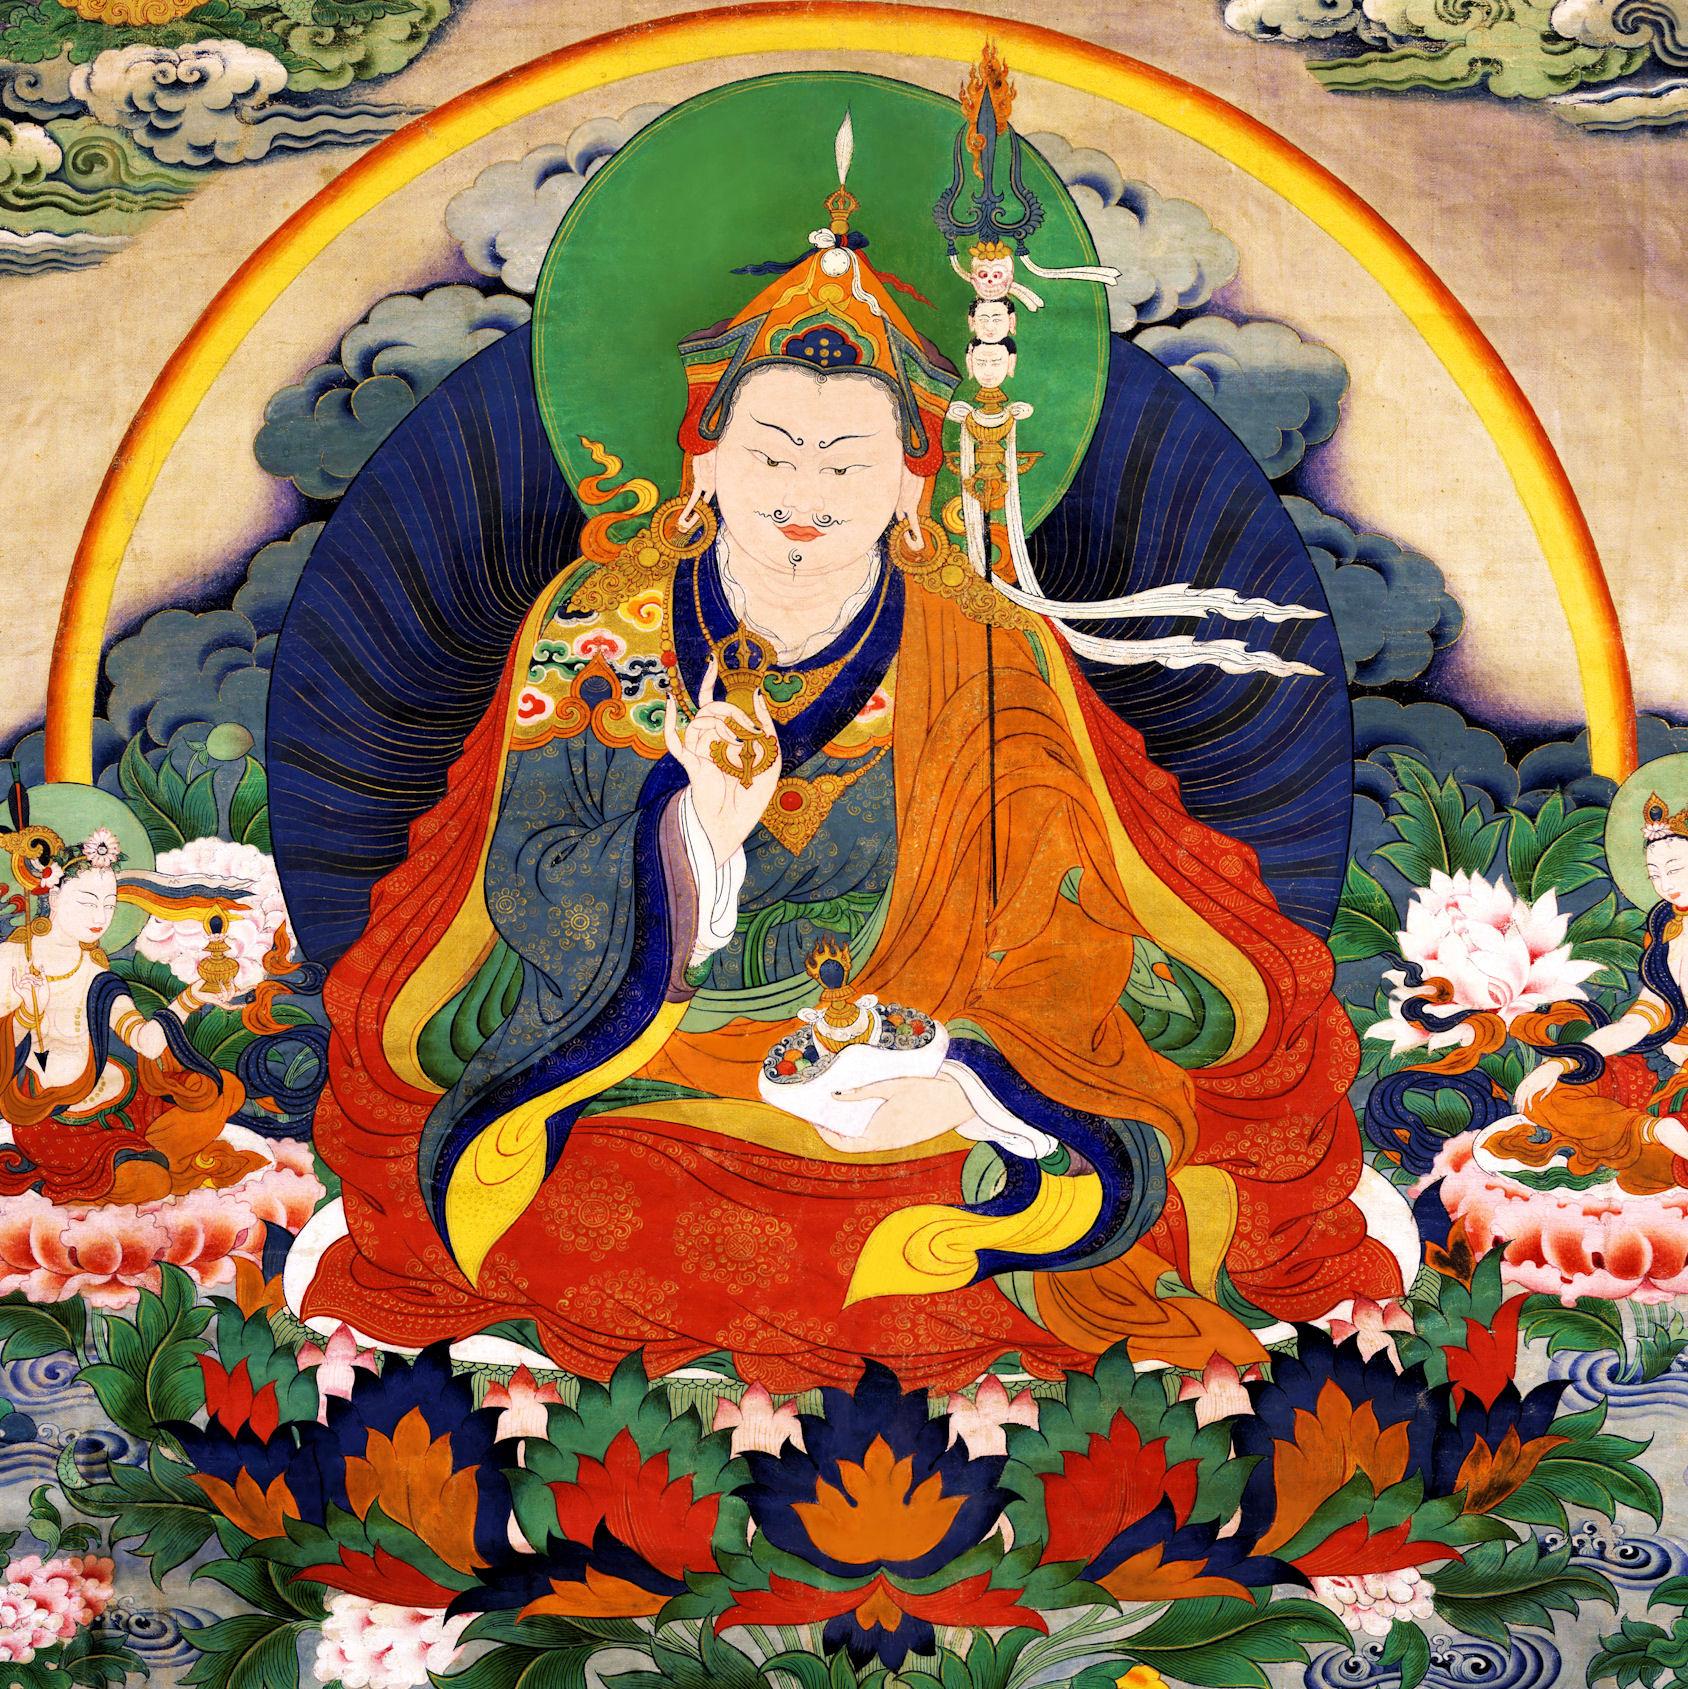 Guru Rinpoche Seven Lines Prayer by Choekyi Gonpo.jpg